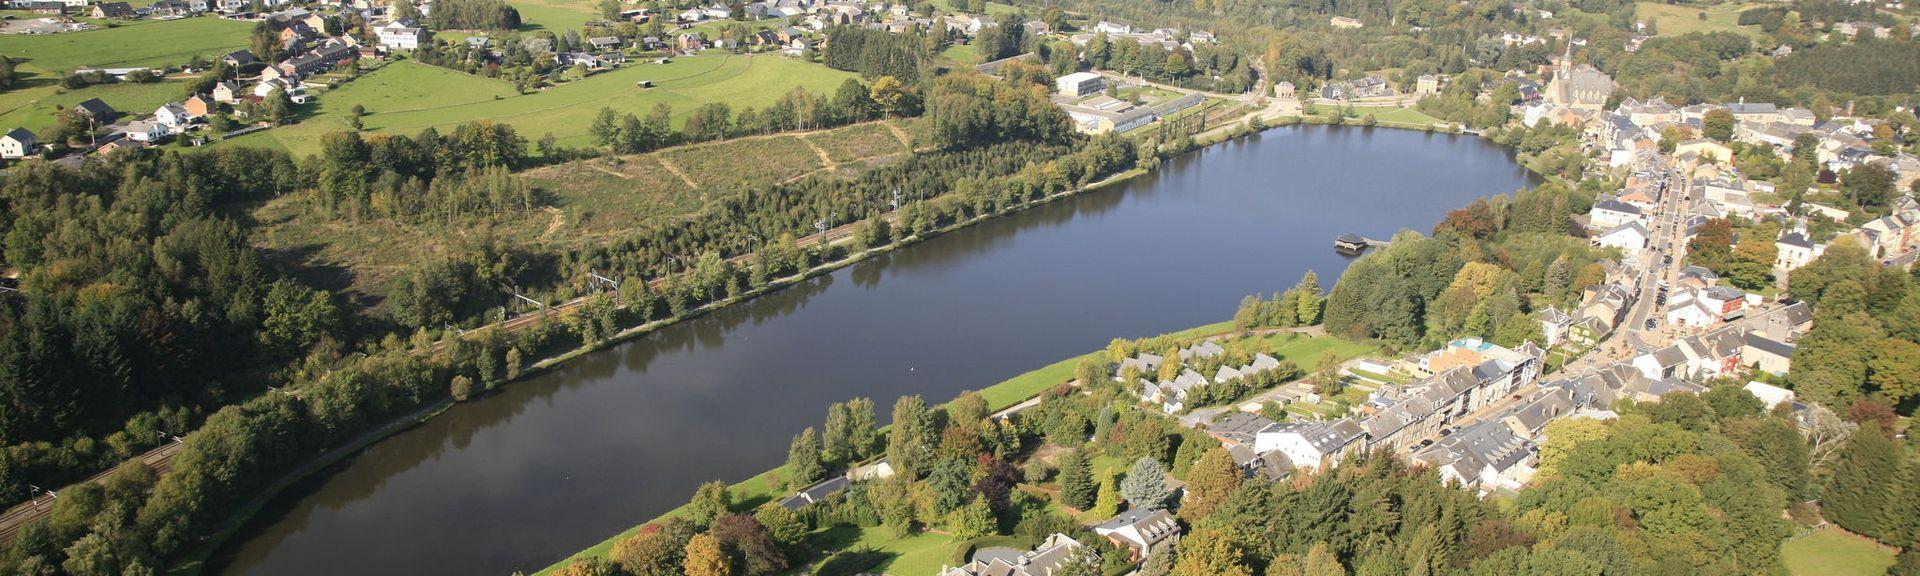 Stavelot, Région wallonne, BE